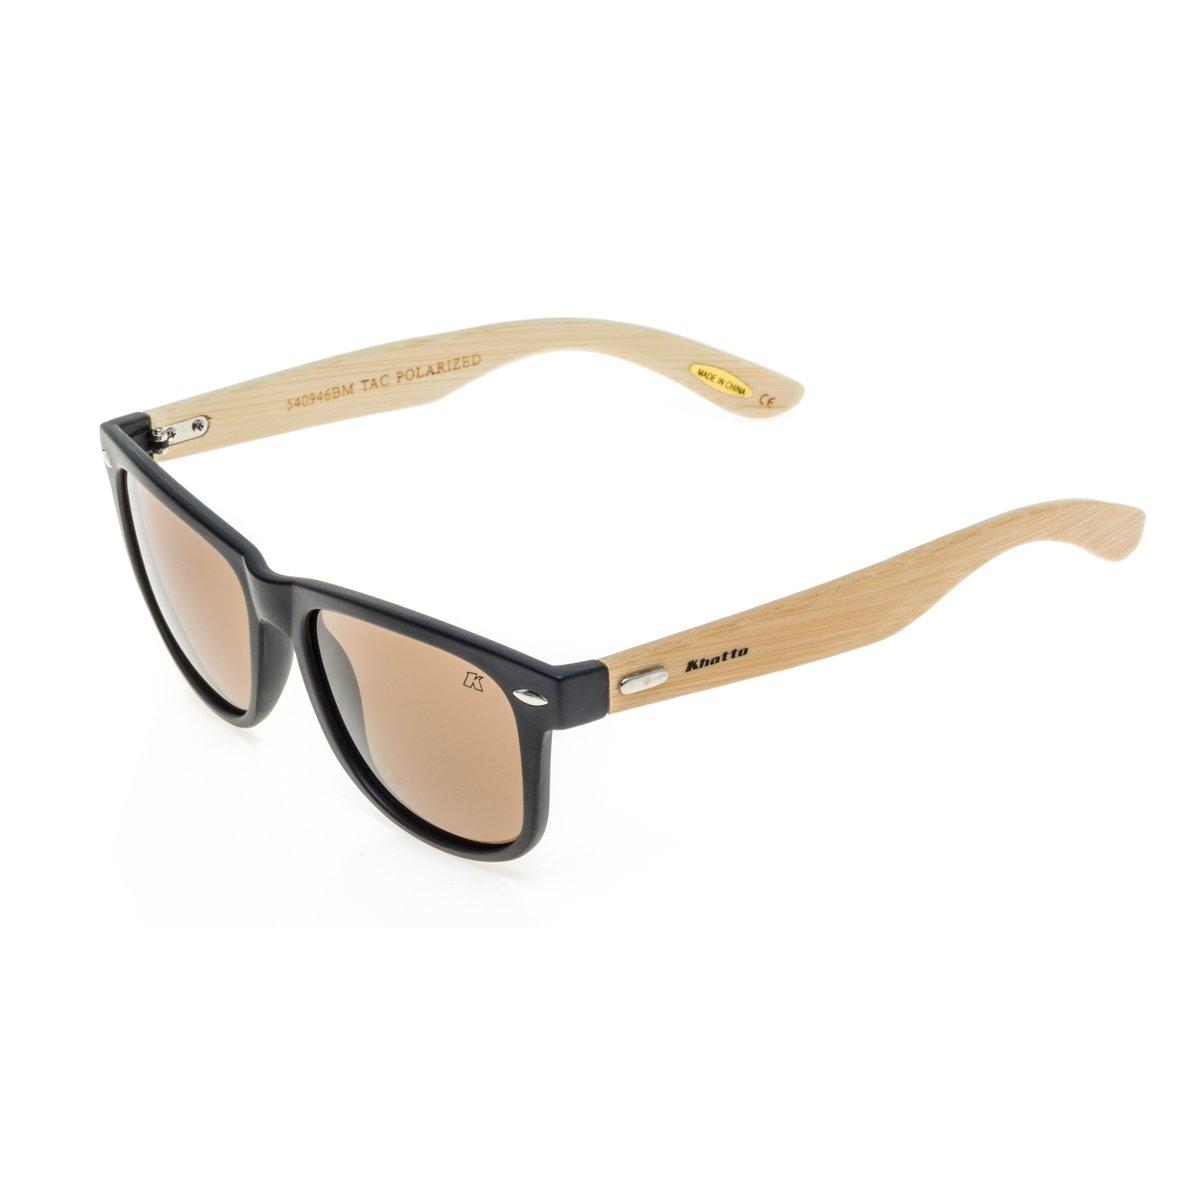 Óculos de Sol Khatto 540946 - Compre Agora   Netshoes 04e44b8943